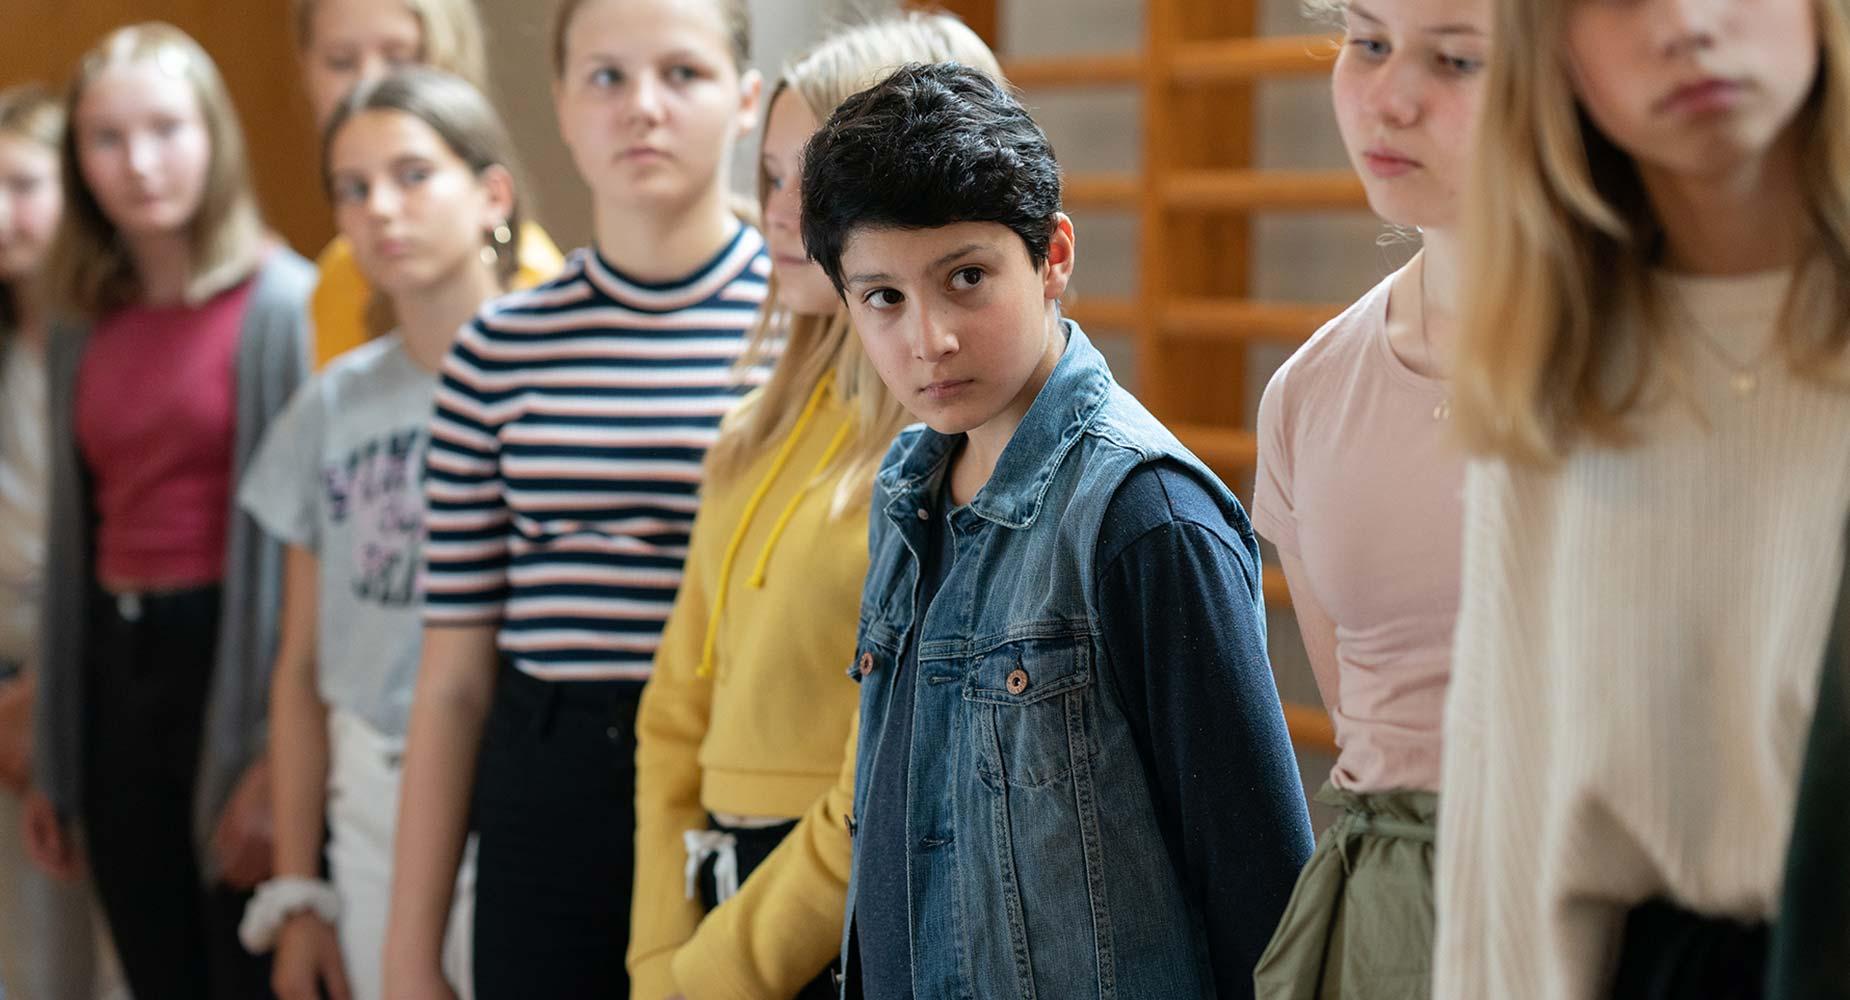 Any Day Now [Ensilumi] — Scandinavian Film Festival 2021